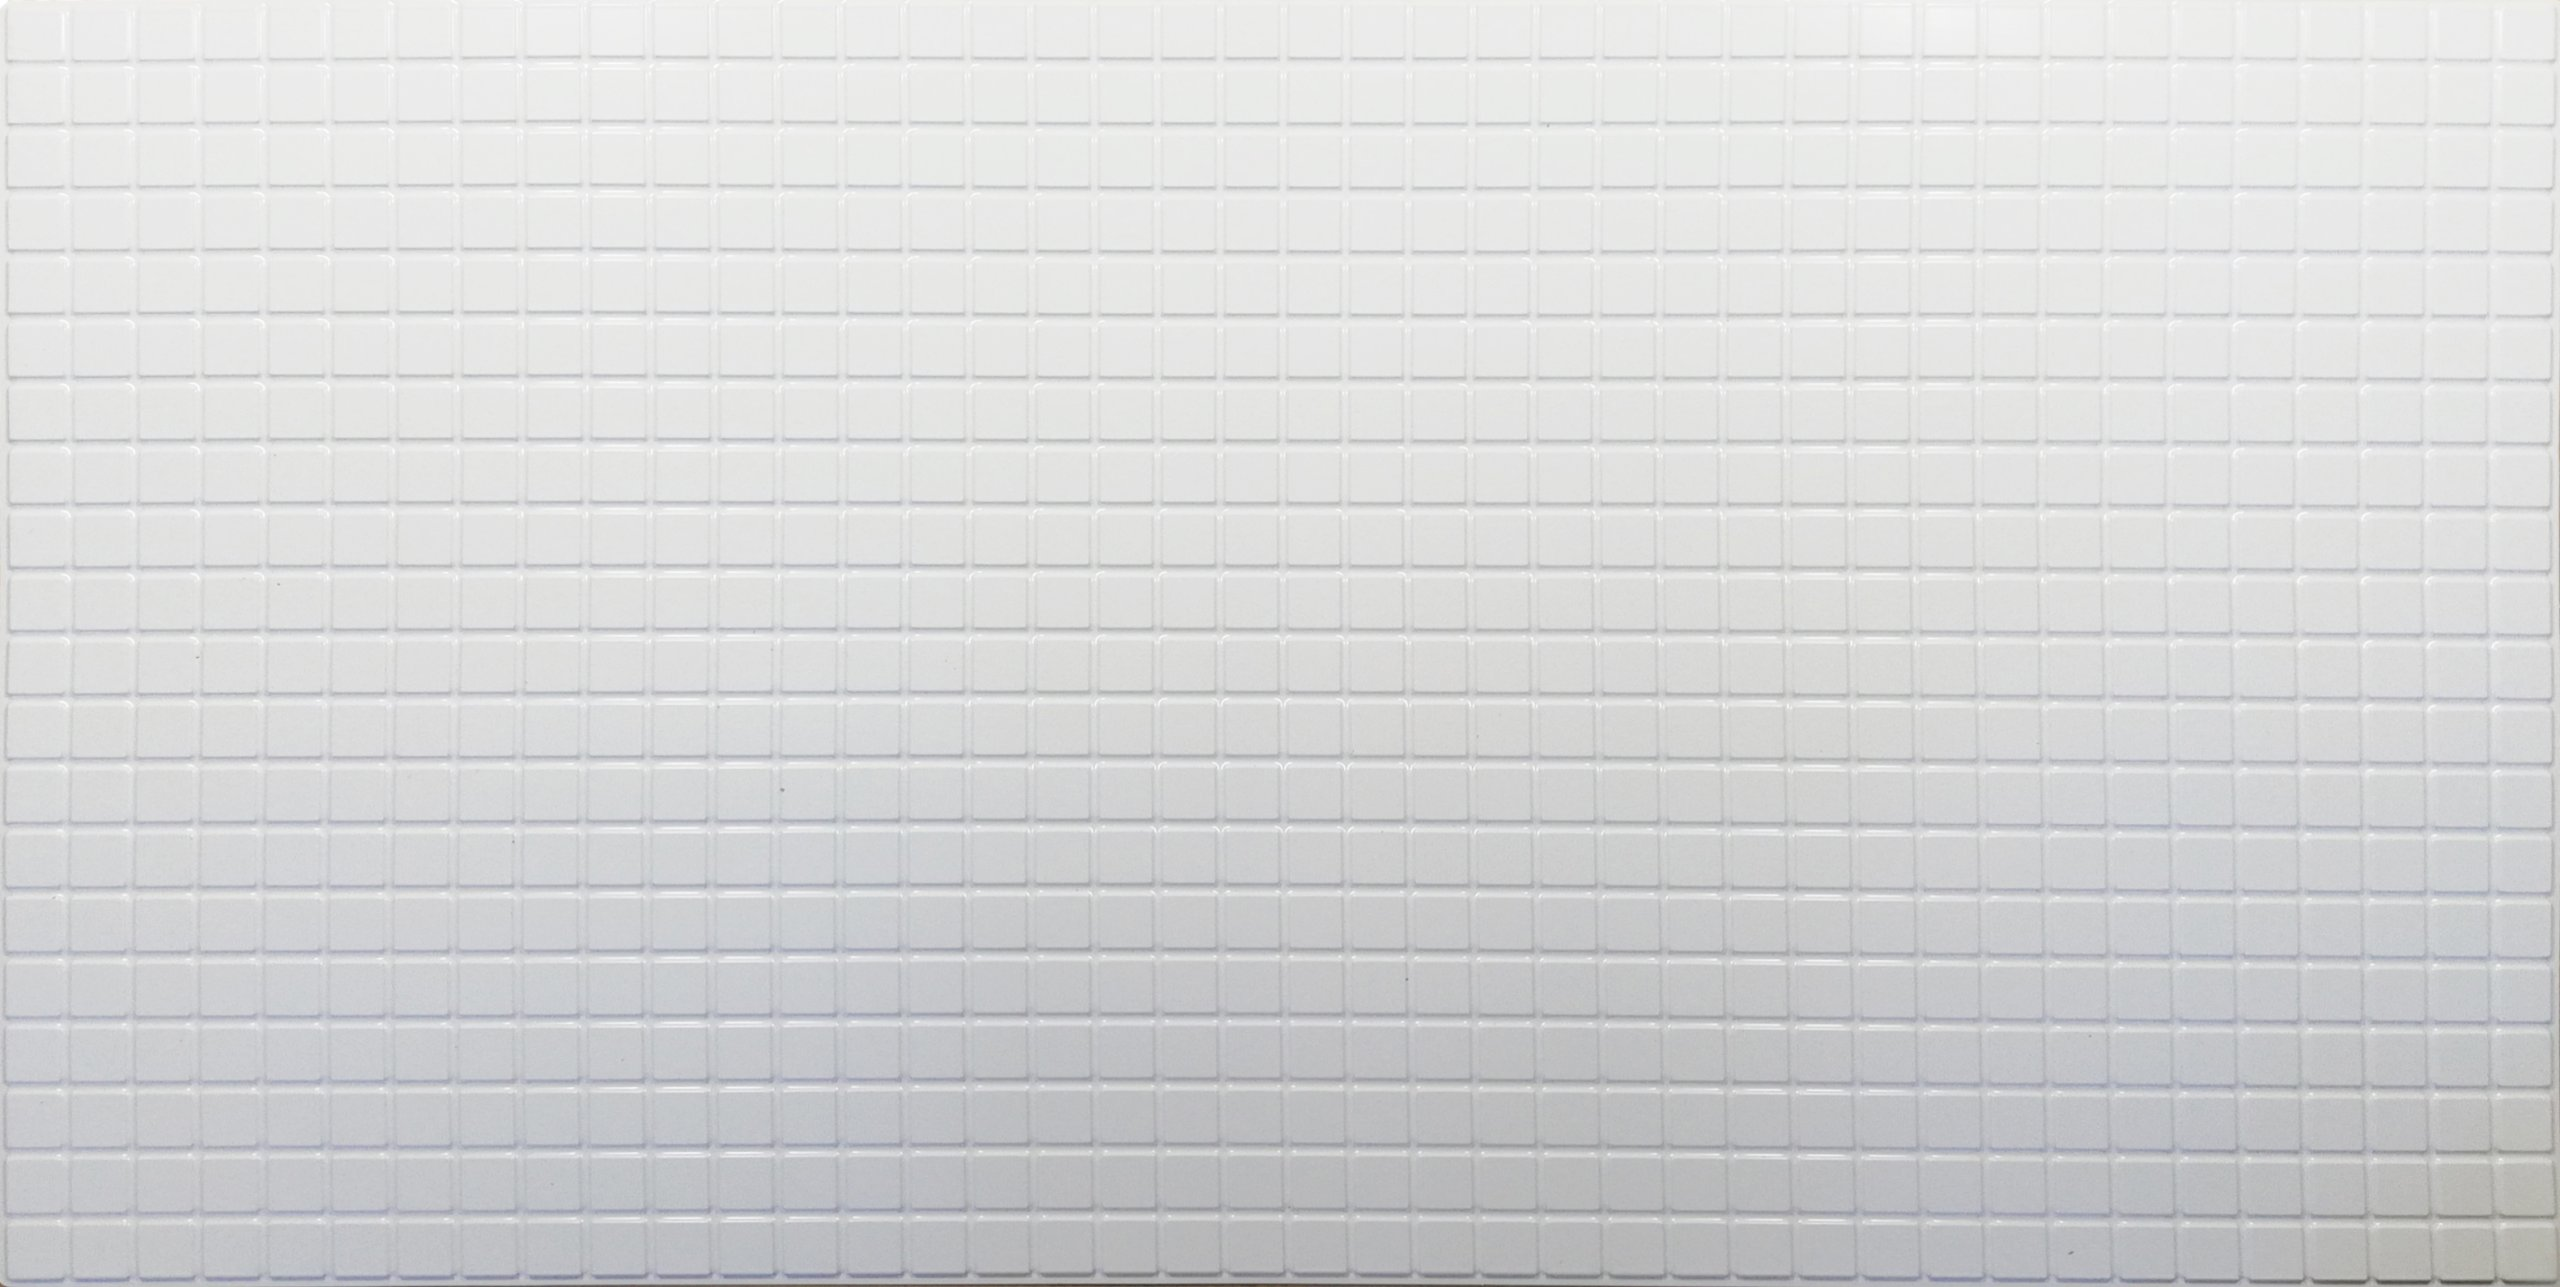 Mozaika Panele ścienne 3d Pcv Białe Hit Promocja